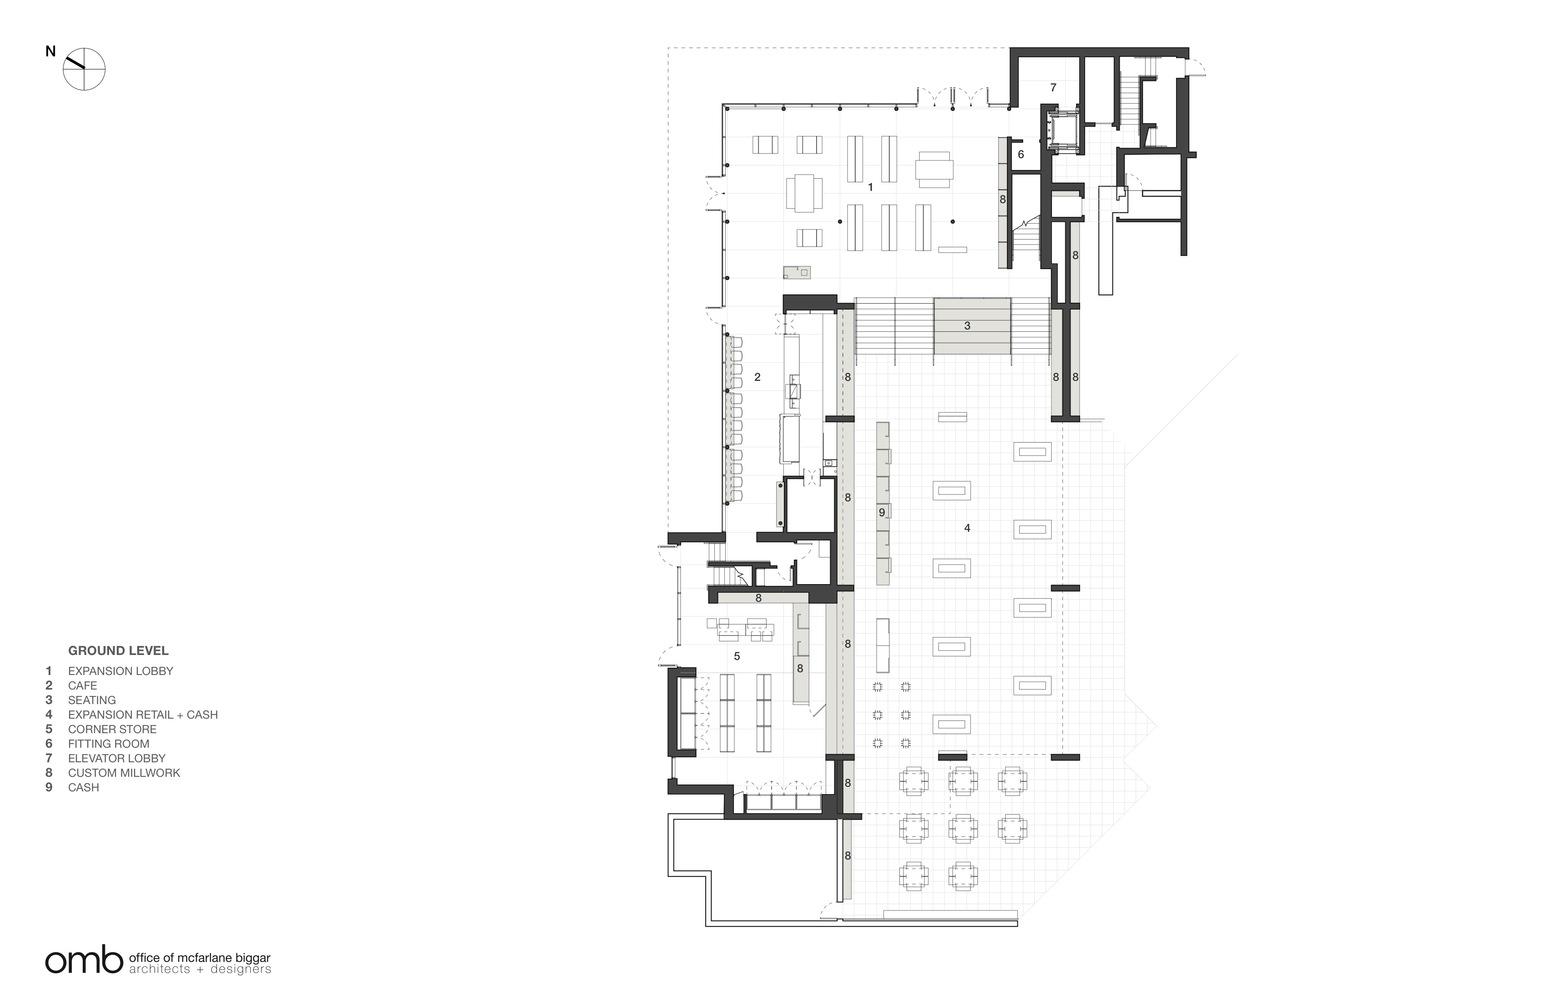 gallery of ubc bookstore office of mcfarlane biggar architects